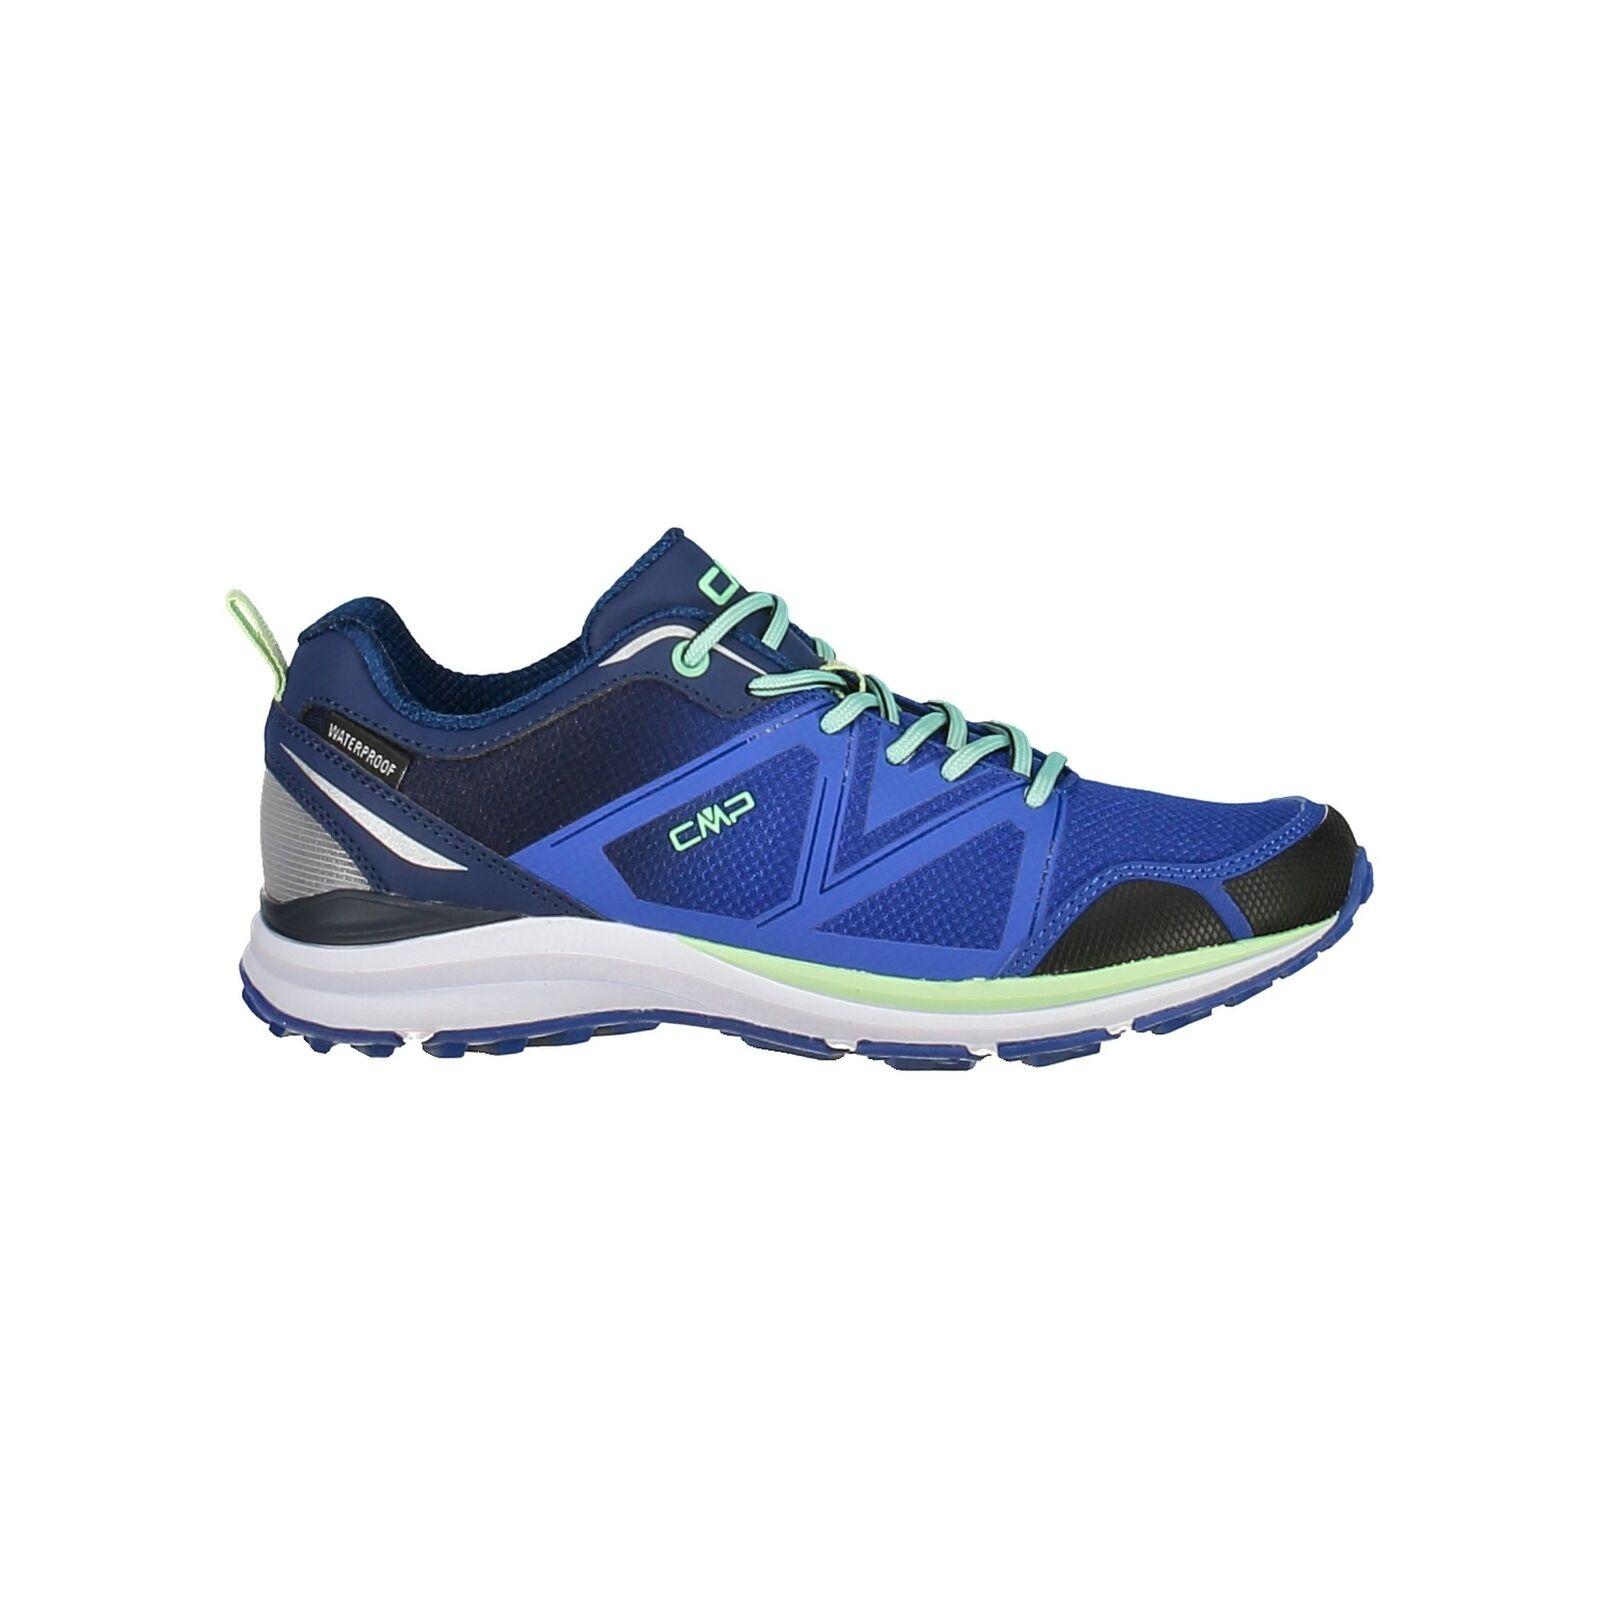 CMP zapatillas  calzado deportivo alya WMN Trail zapatos WP azul impermeable transpirable  precios razonables